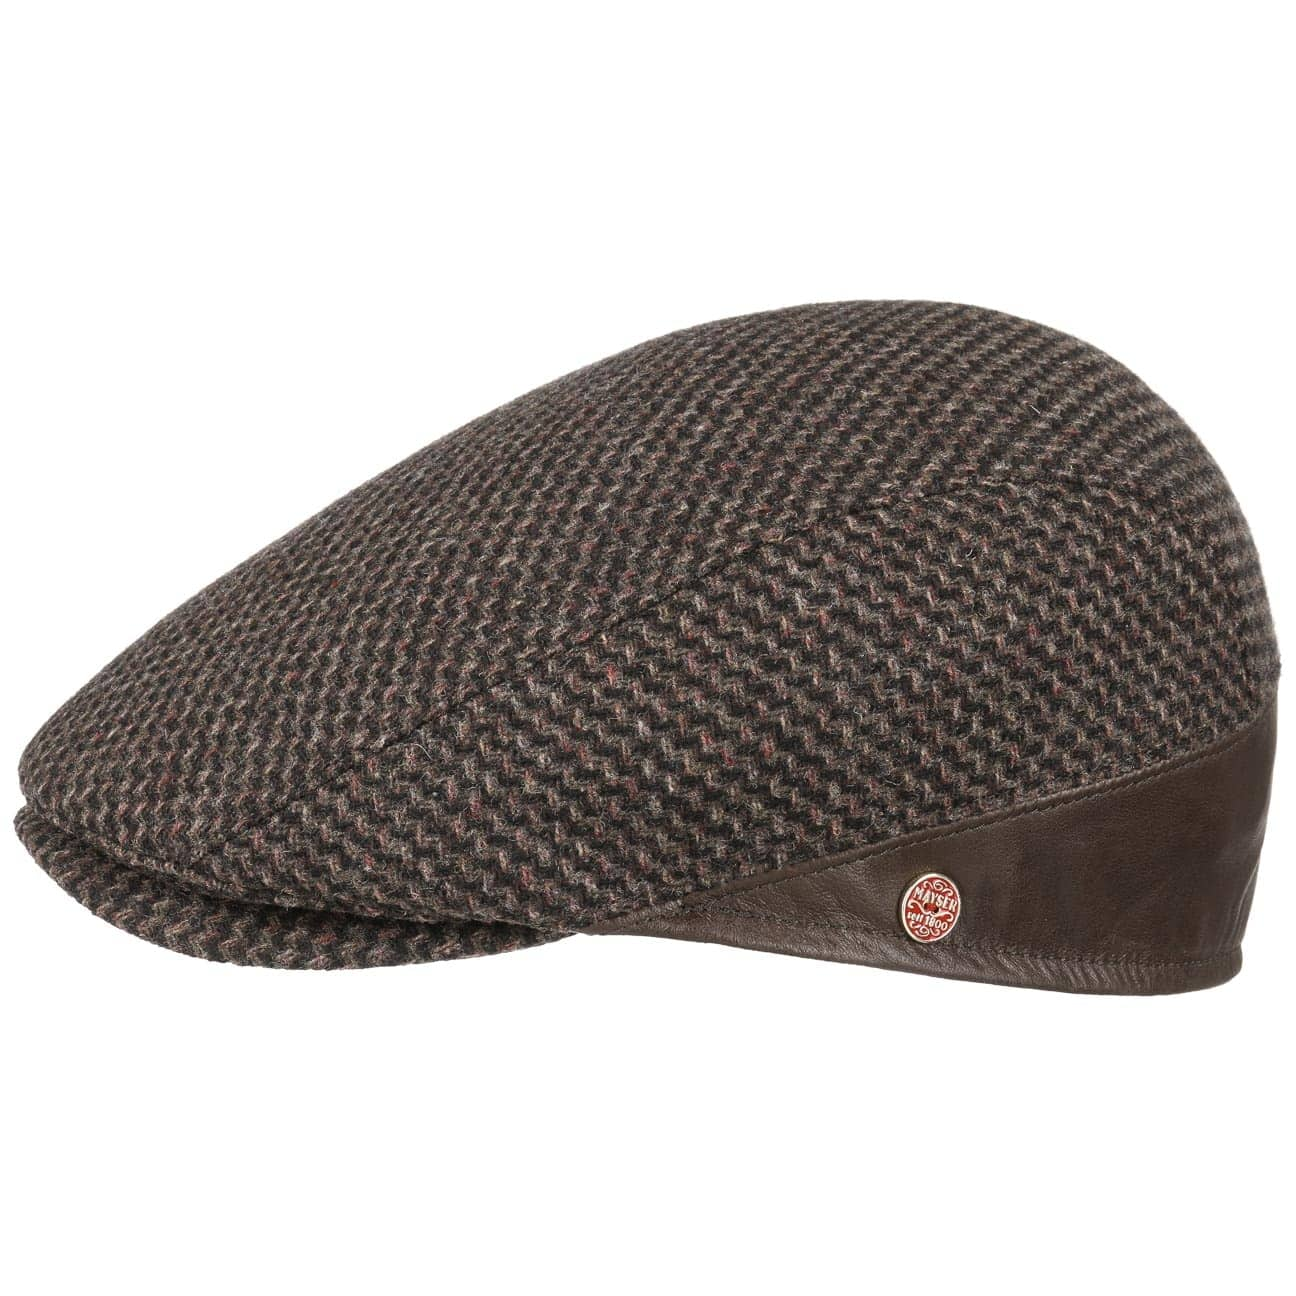 delian-wool-flatcap-mit-lederdetails-by-mayser-schiebermutze